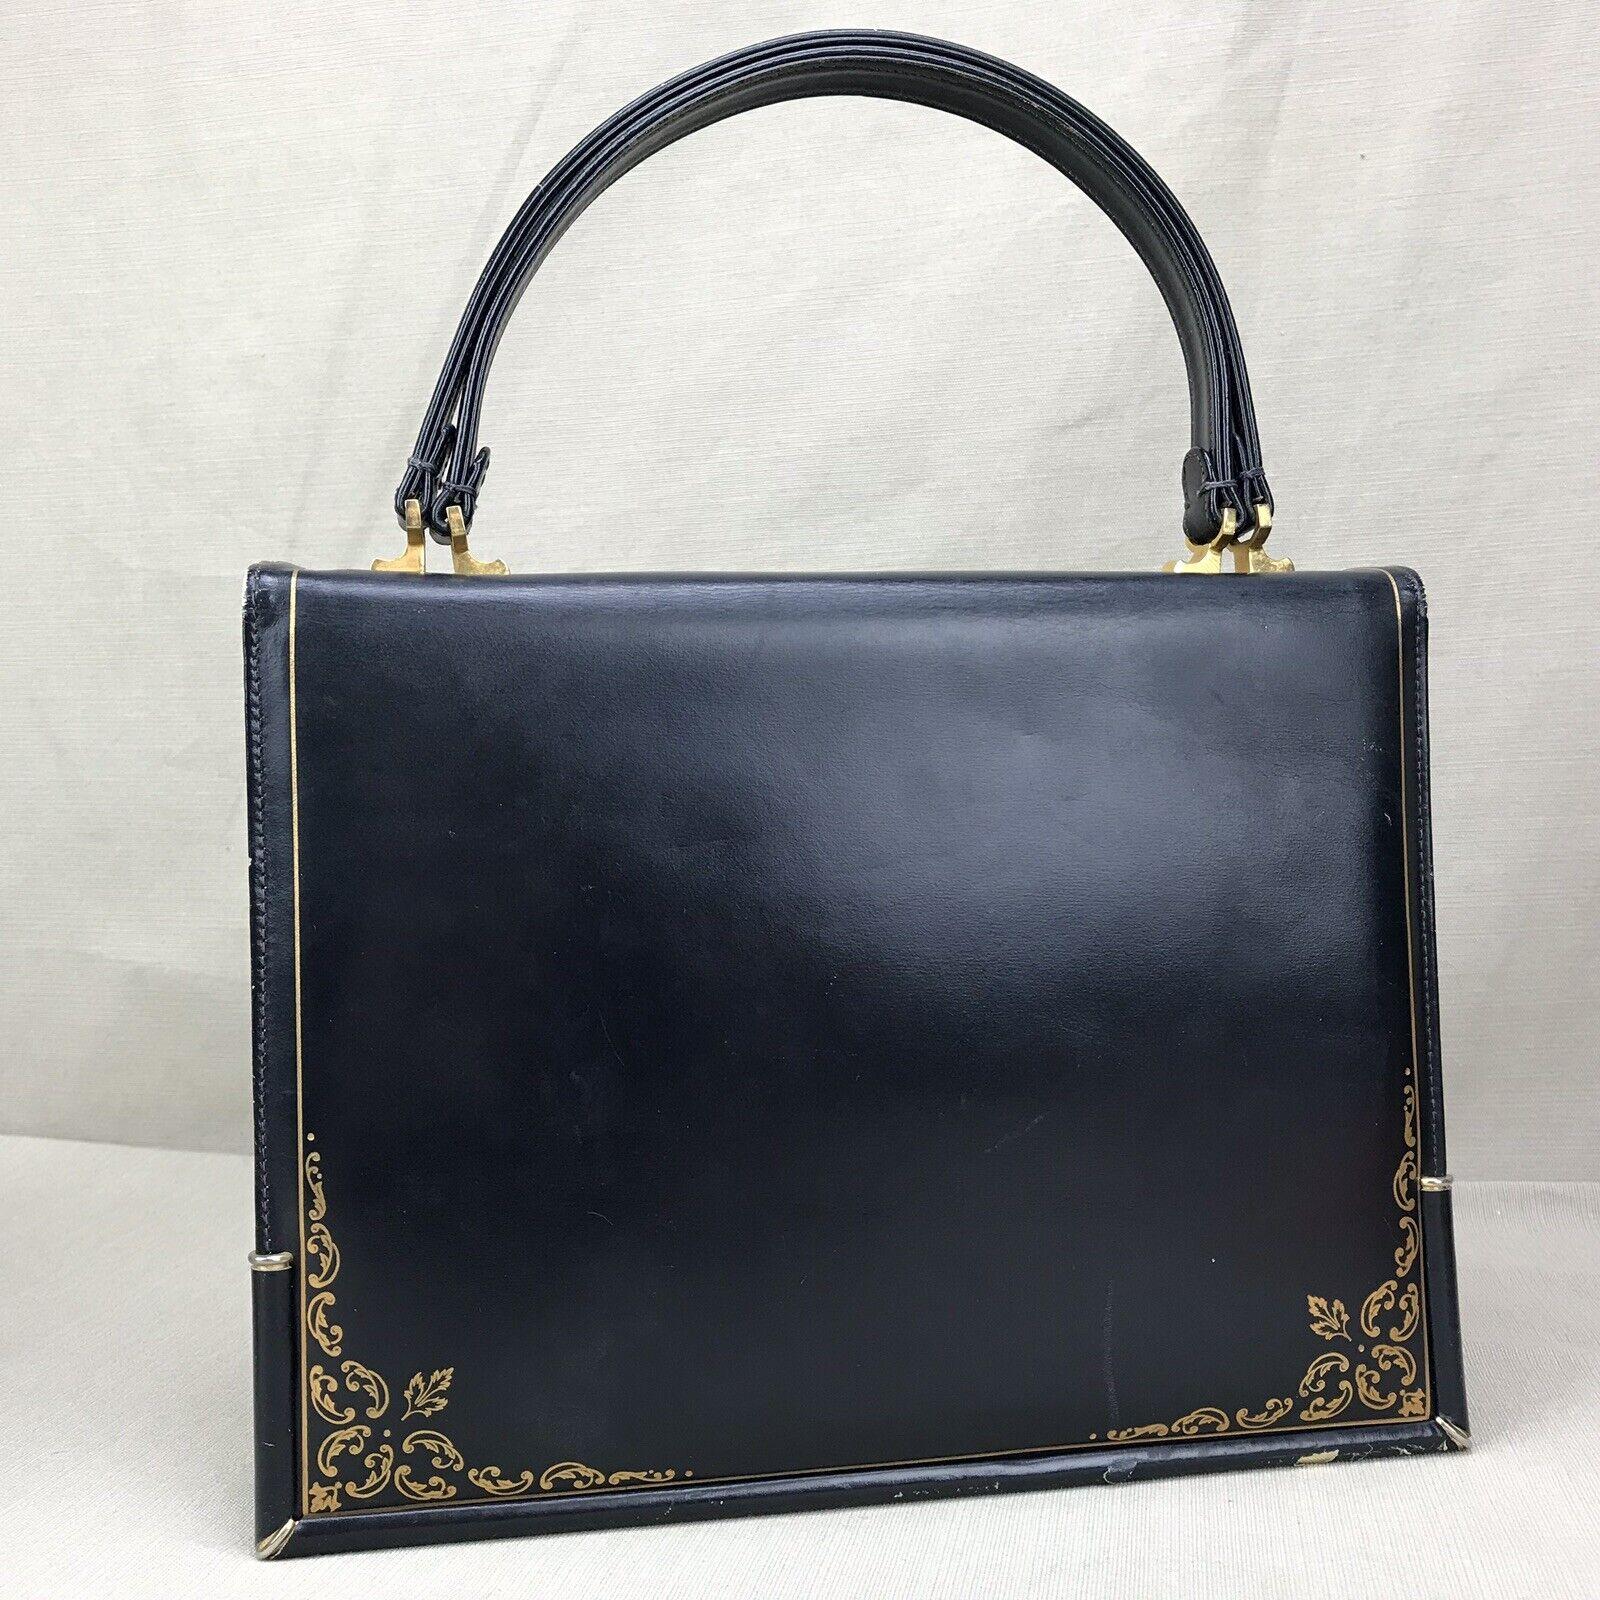 Scuola del Cuoio Vintage 1950s Purse Blue Gold Em… - image 2